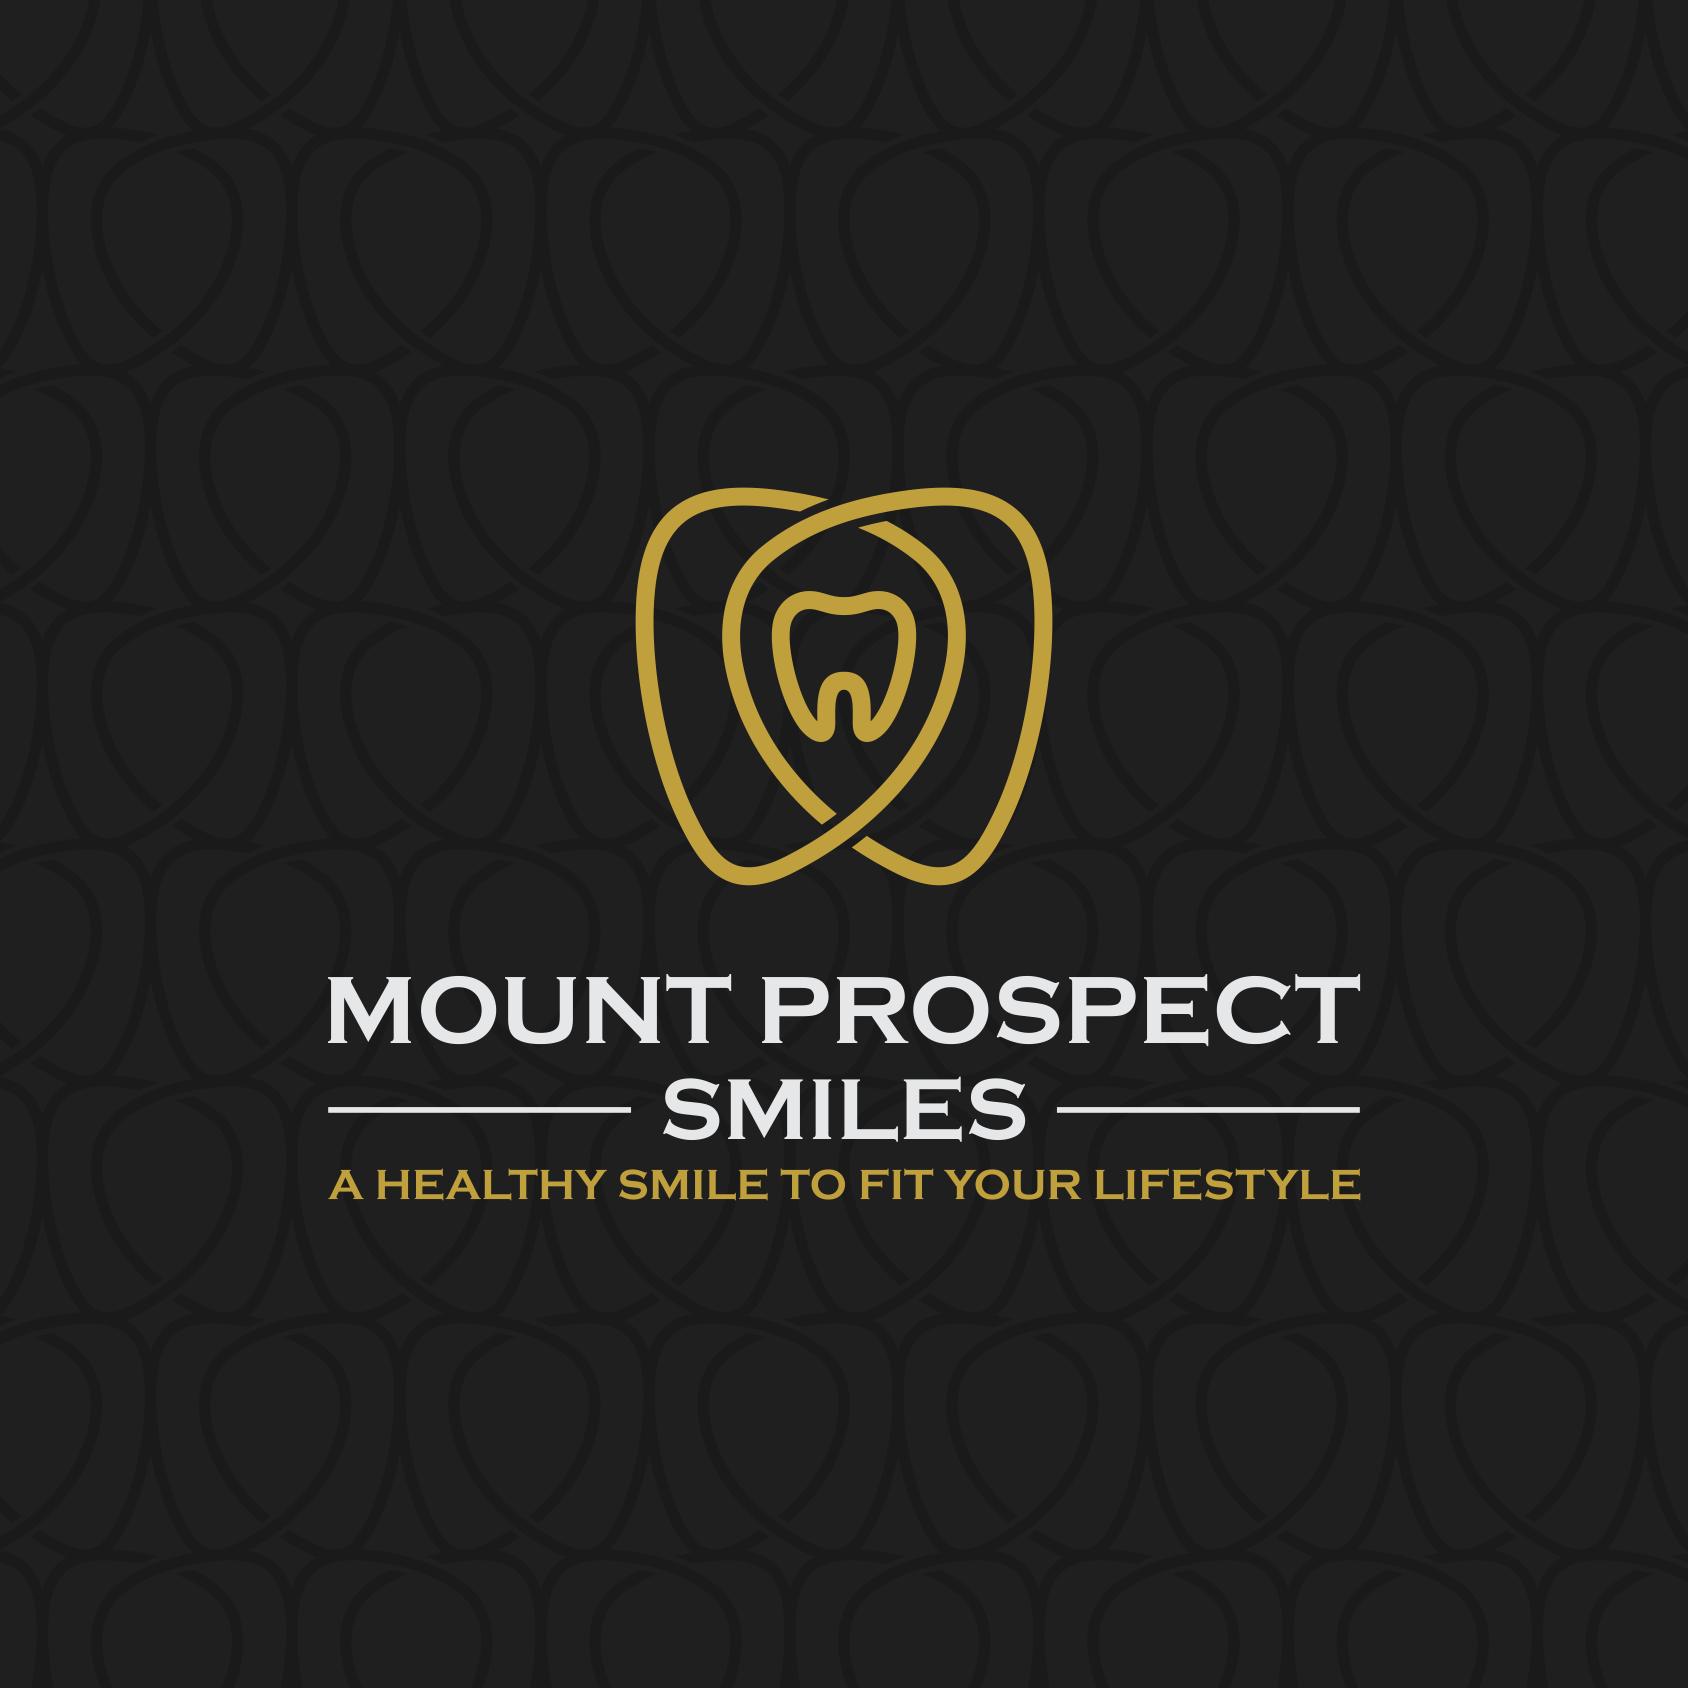 Mount Prospect Smiles